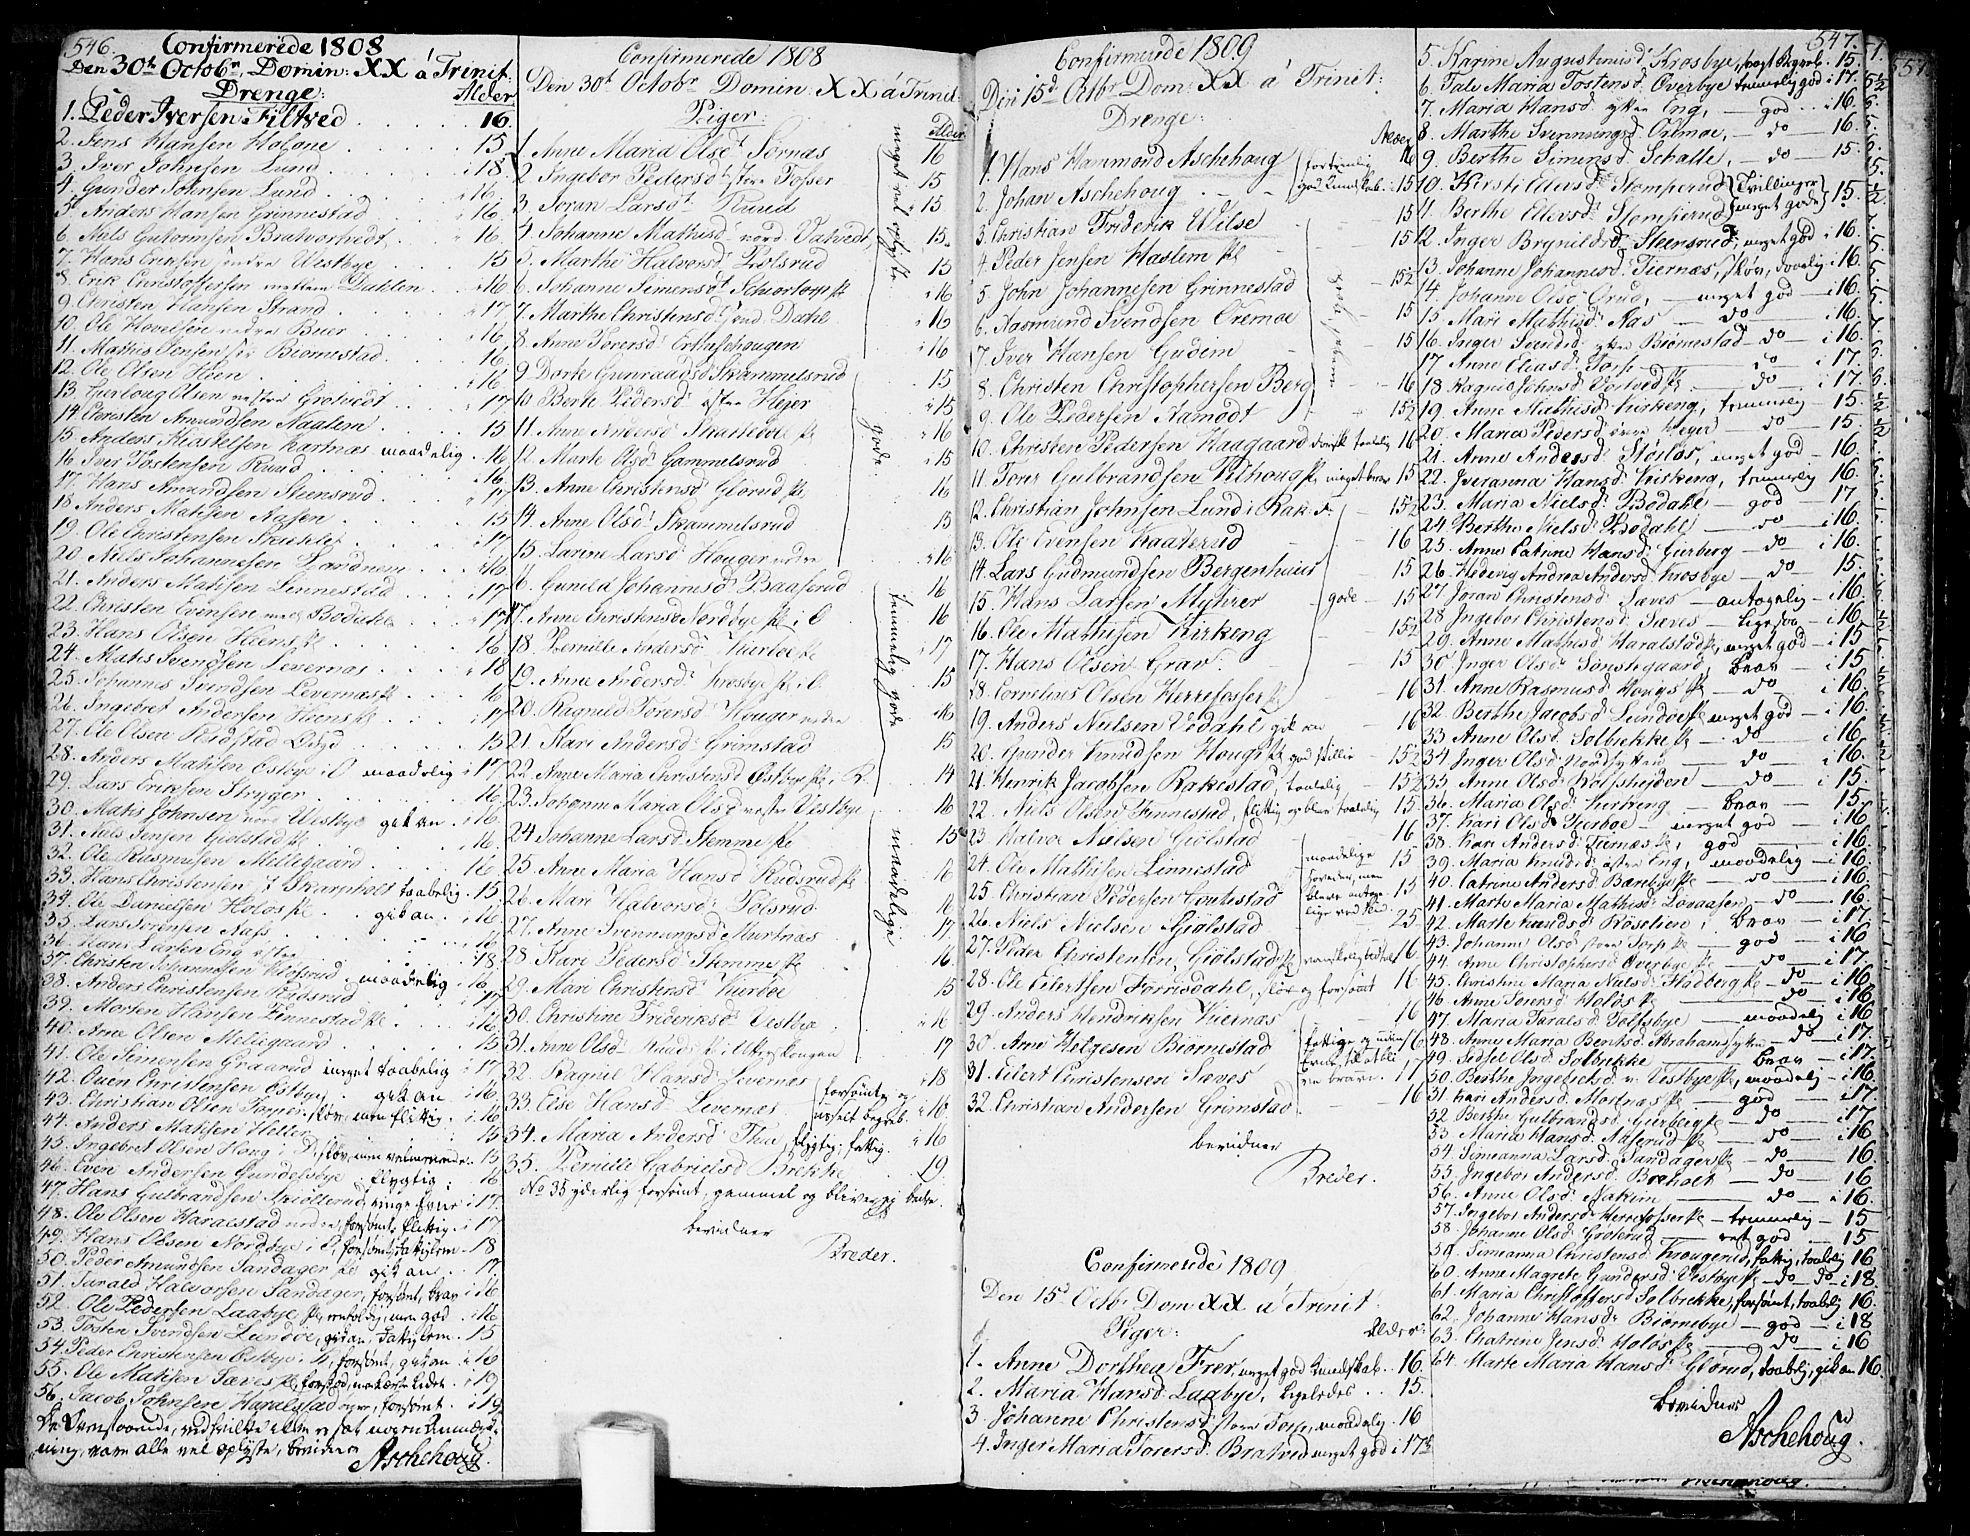 SAO, Rakkestad prestekontor Kirkebøker, F/Fa/L0005: Ministerialbok nr. I 5, 1784-1814, s. 546-547